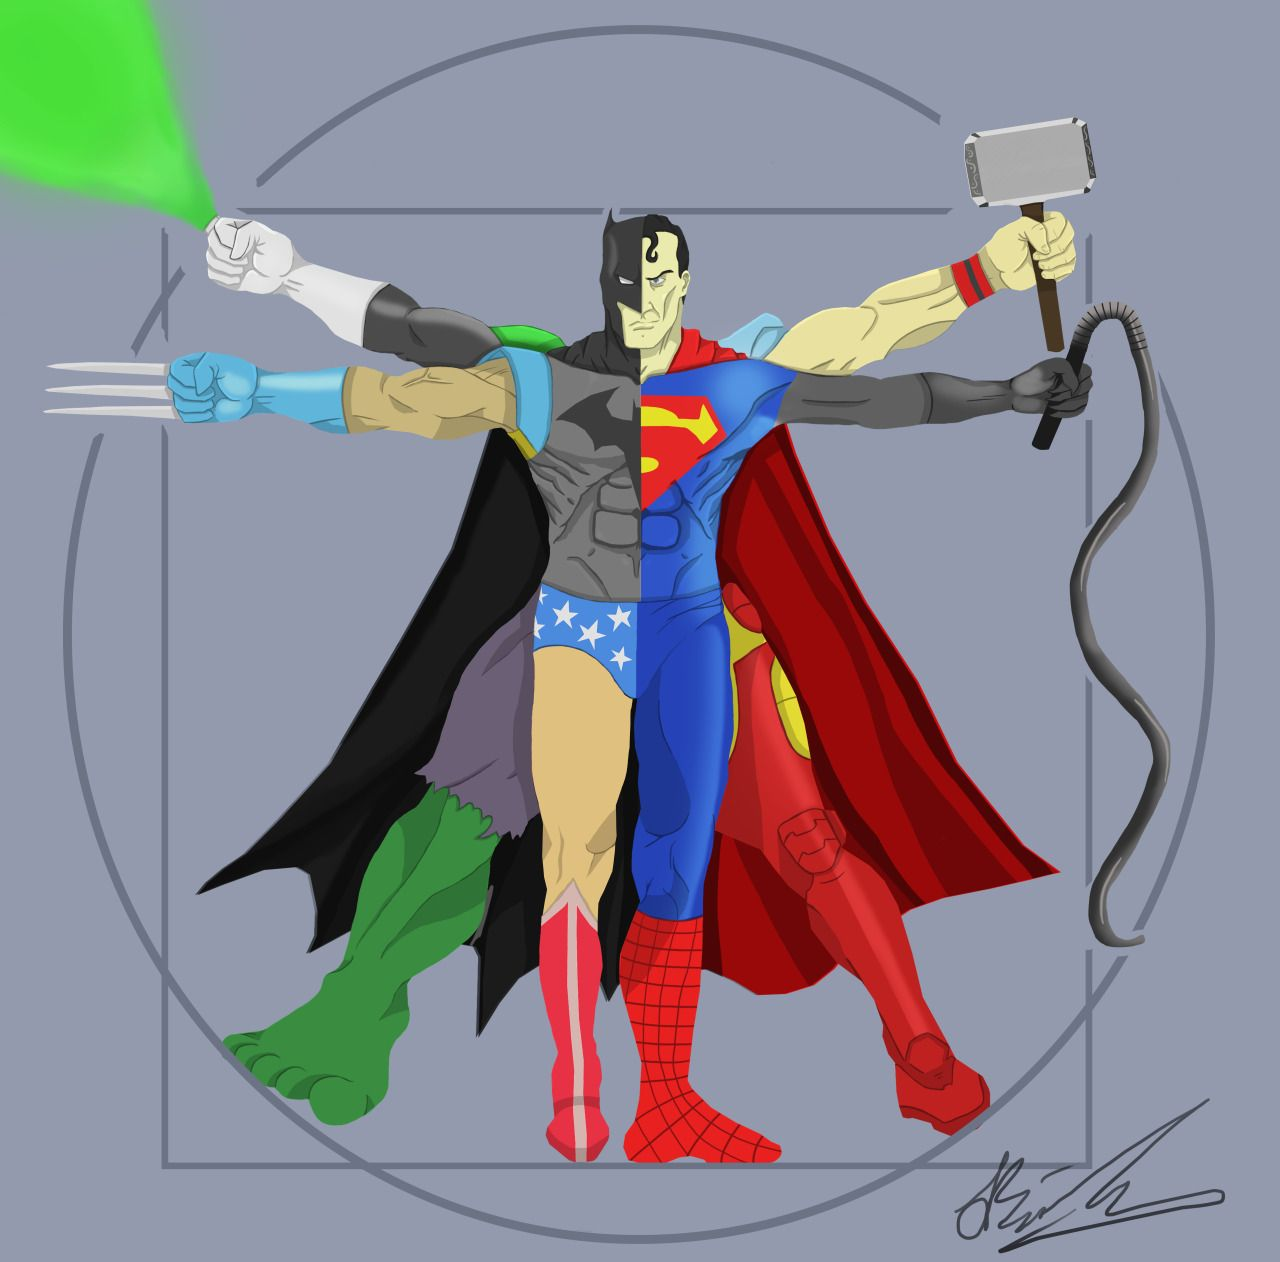 Superheroes inspired by Da Vinci